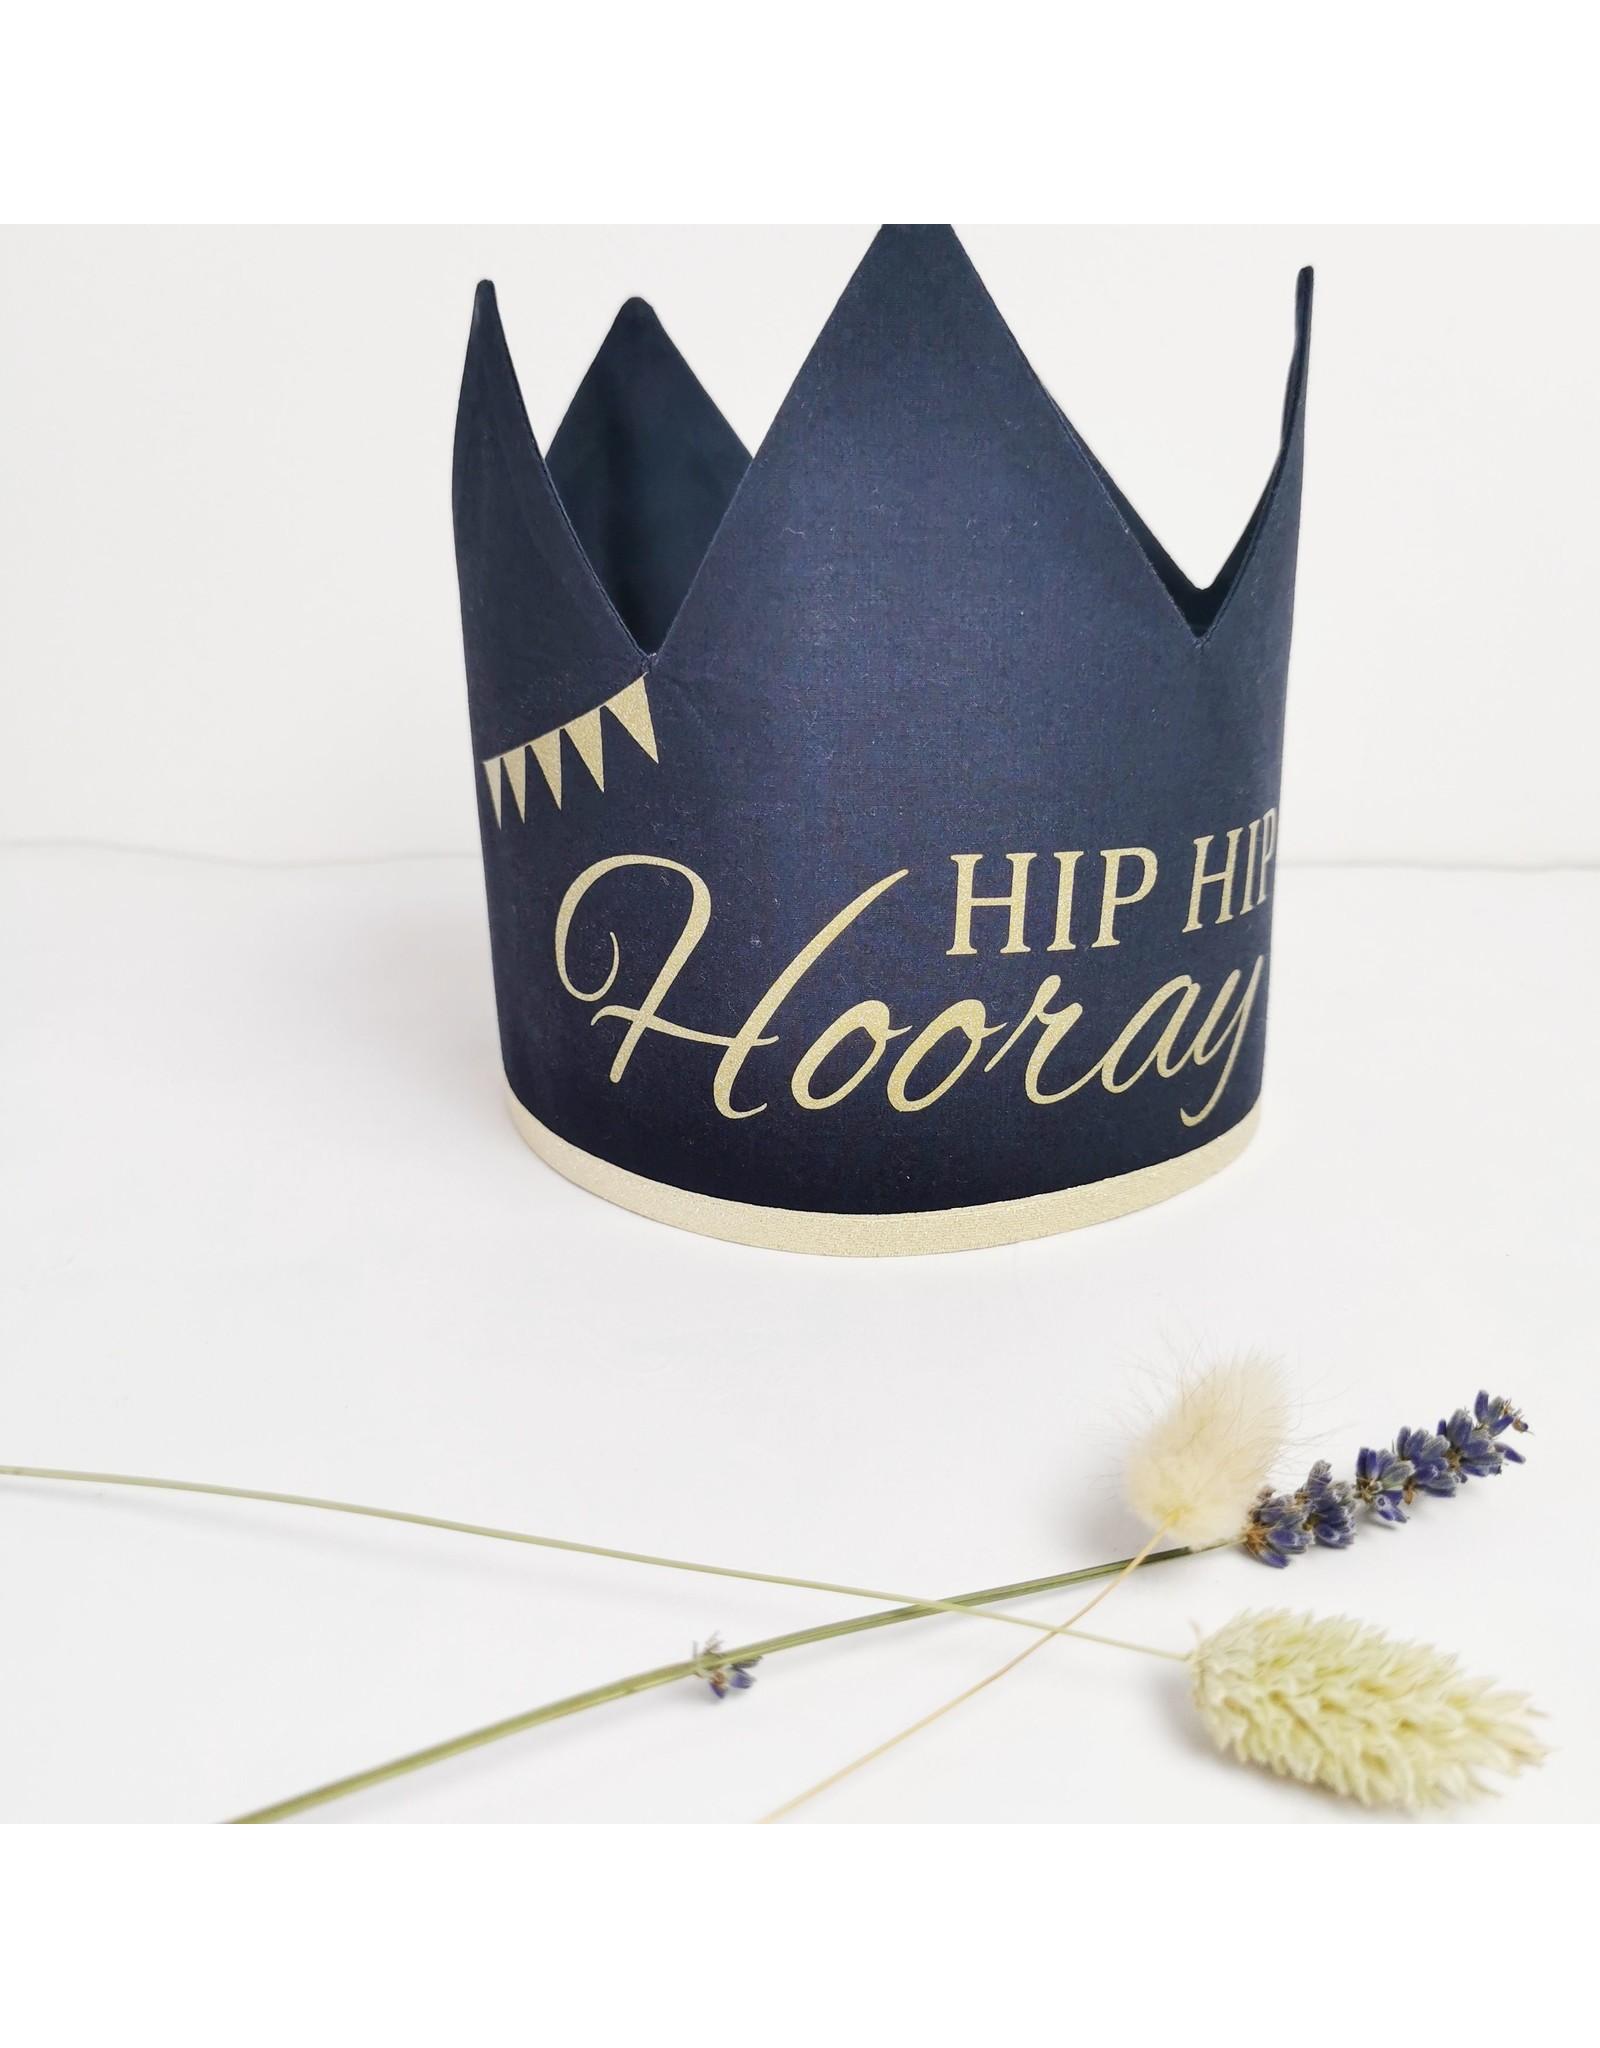 Momof3 kroon hip hip hooray